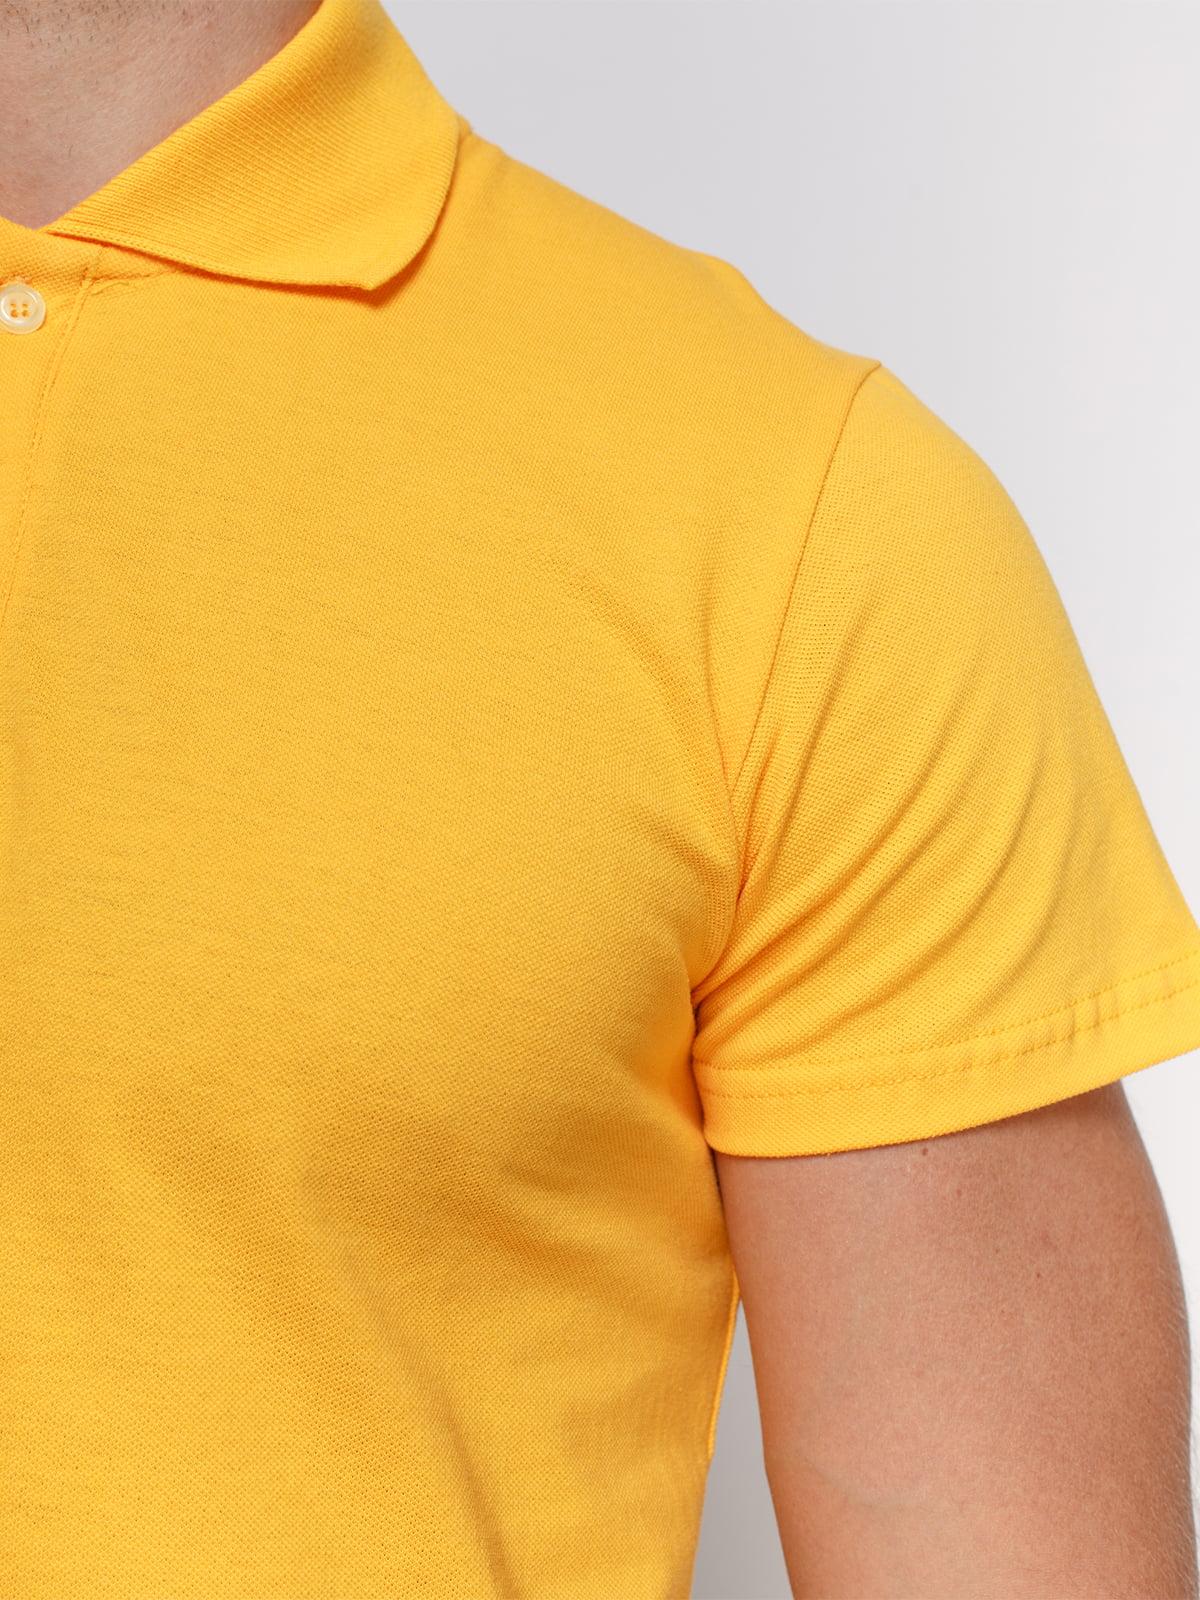 Футболка-поло жовта | 4768981 | фото 3